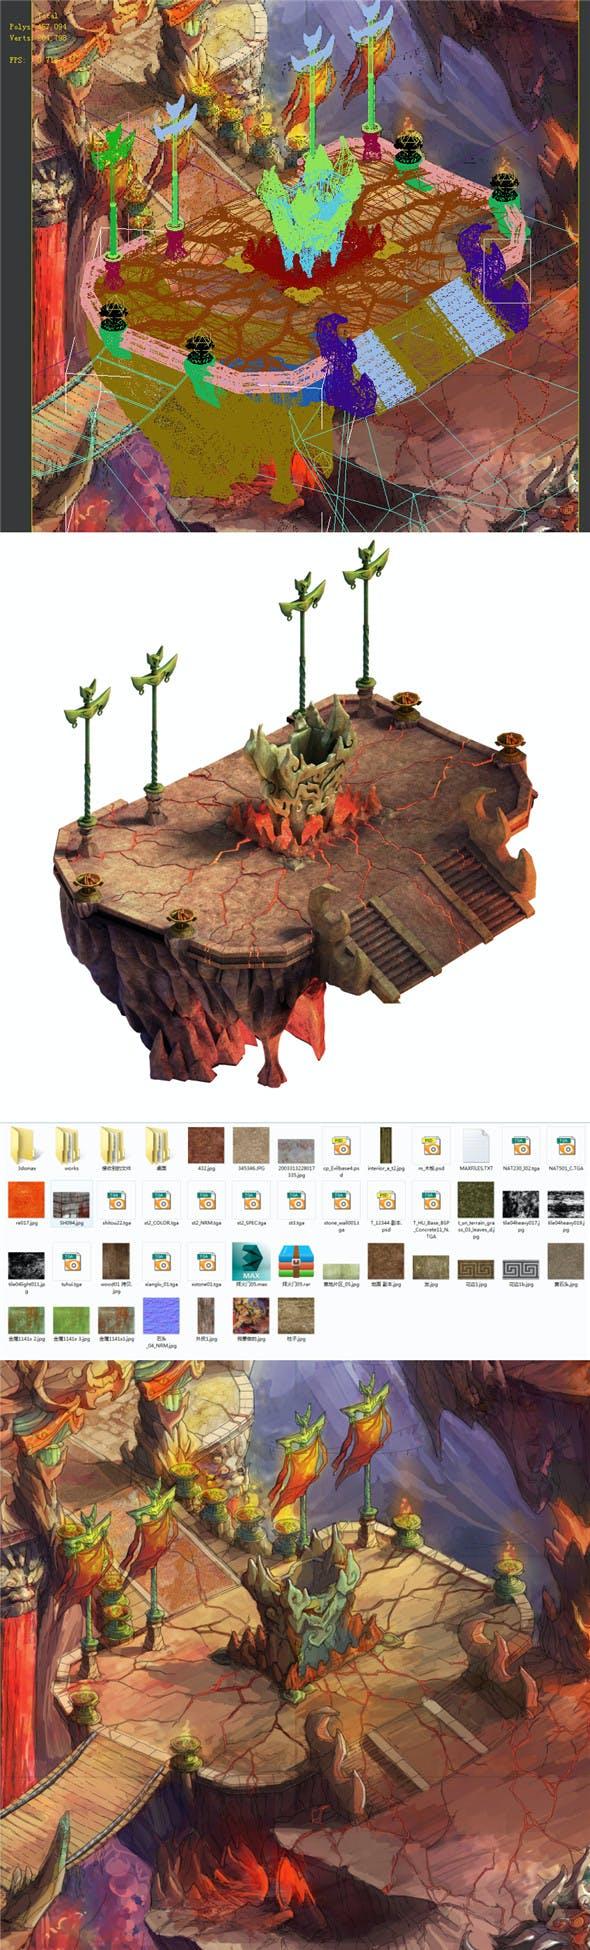 Built on cliff religion Zoroastrianism Great Altar 01 - 3DOcean Item for Sale